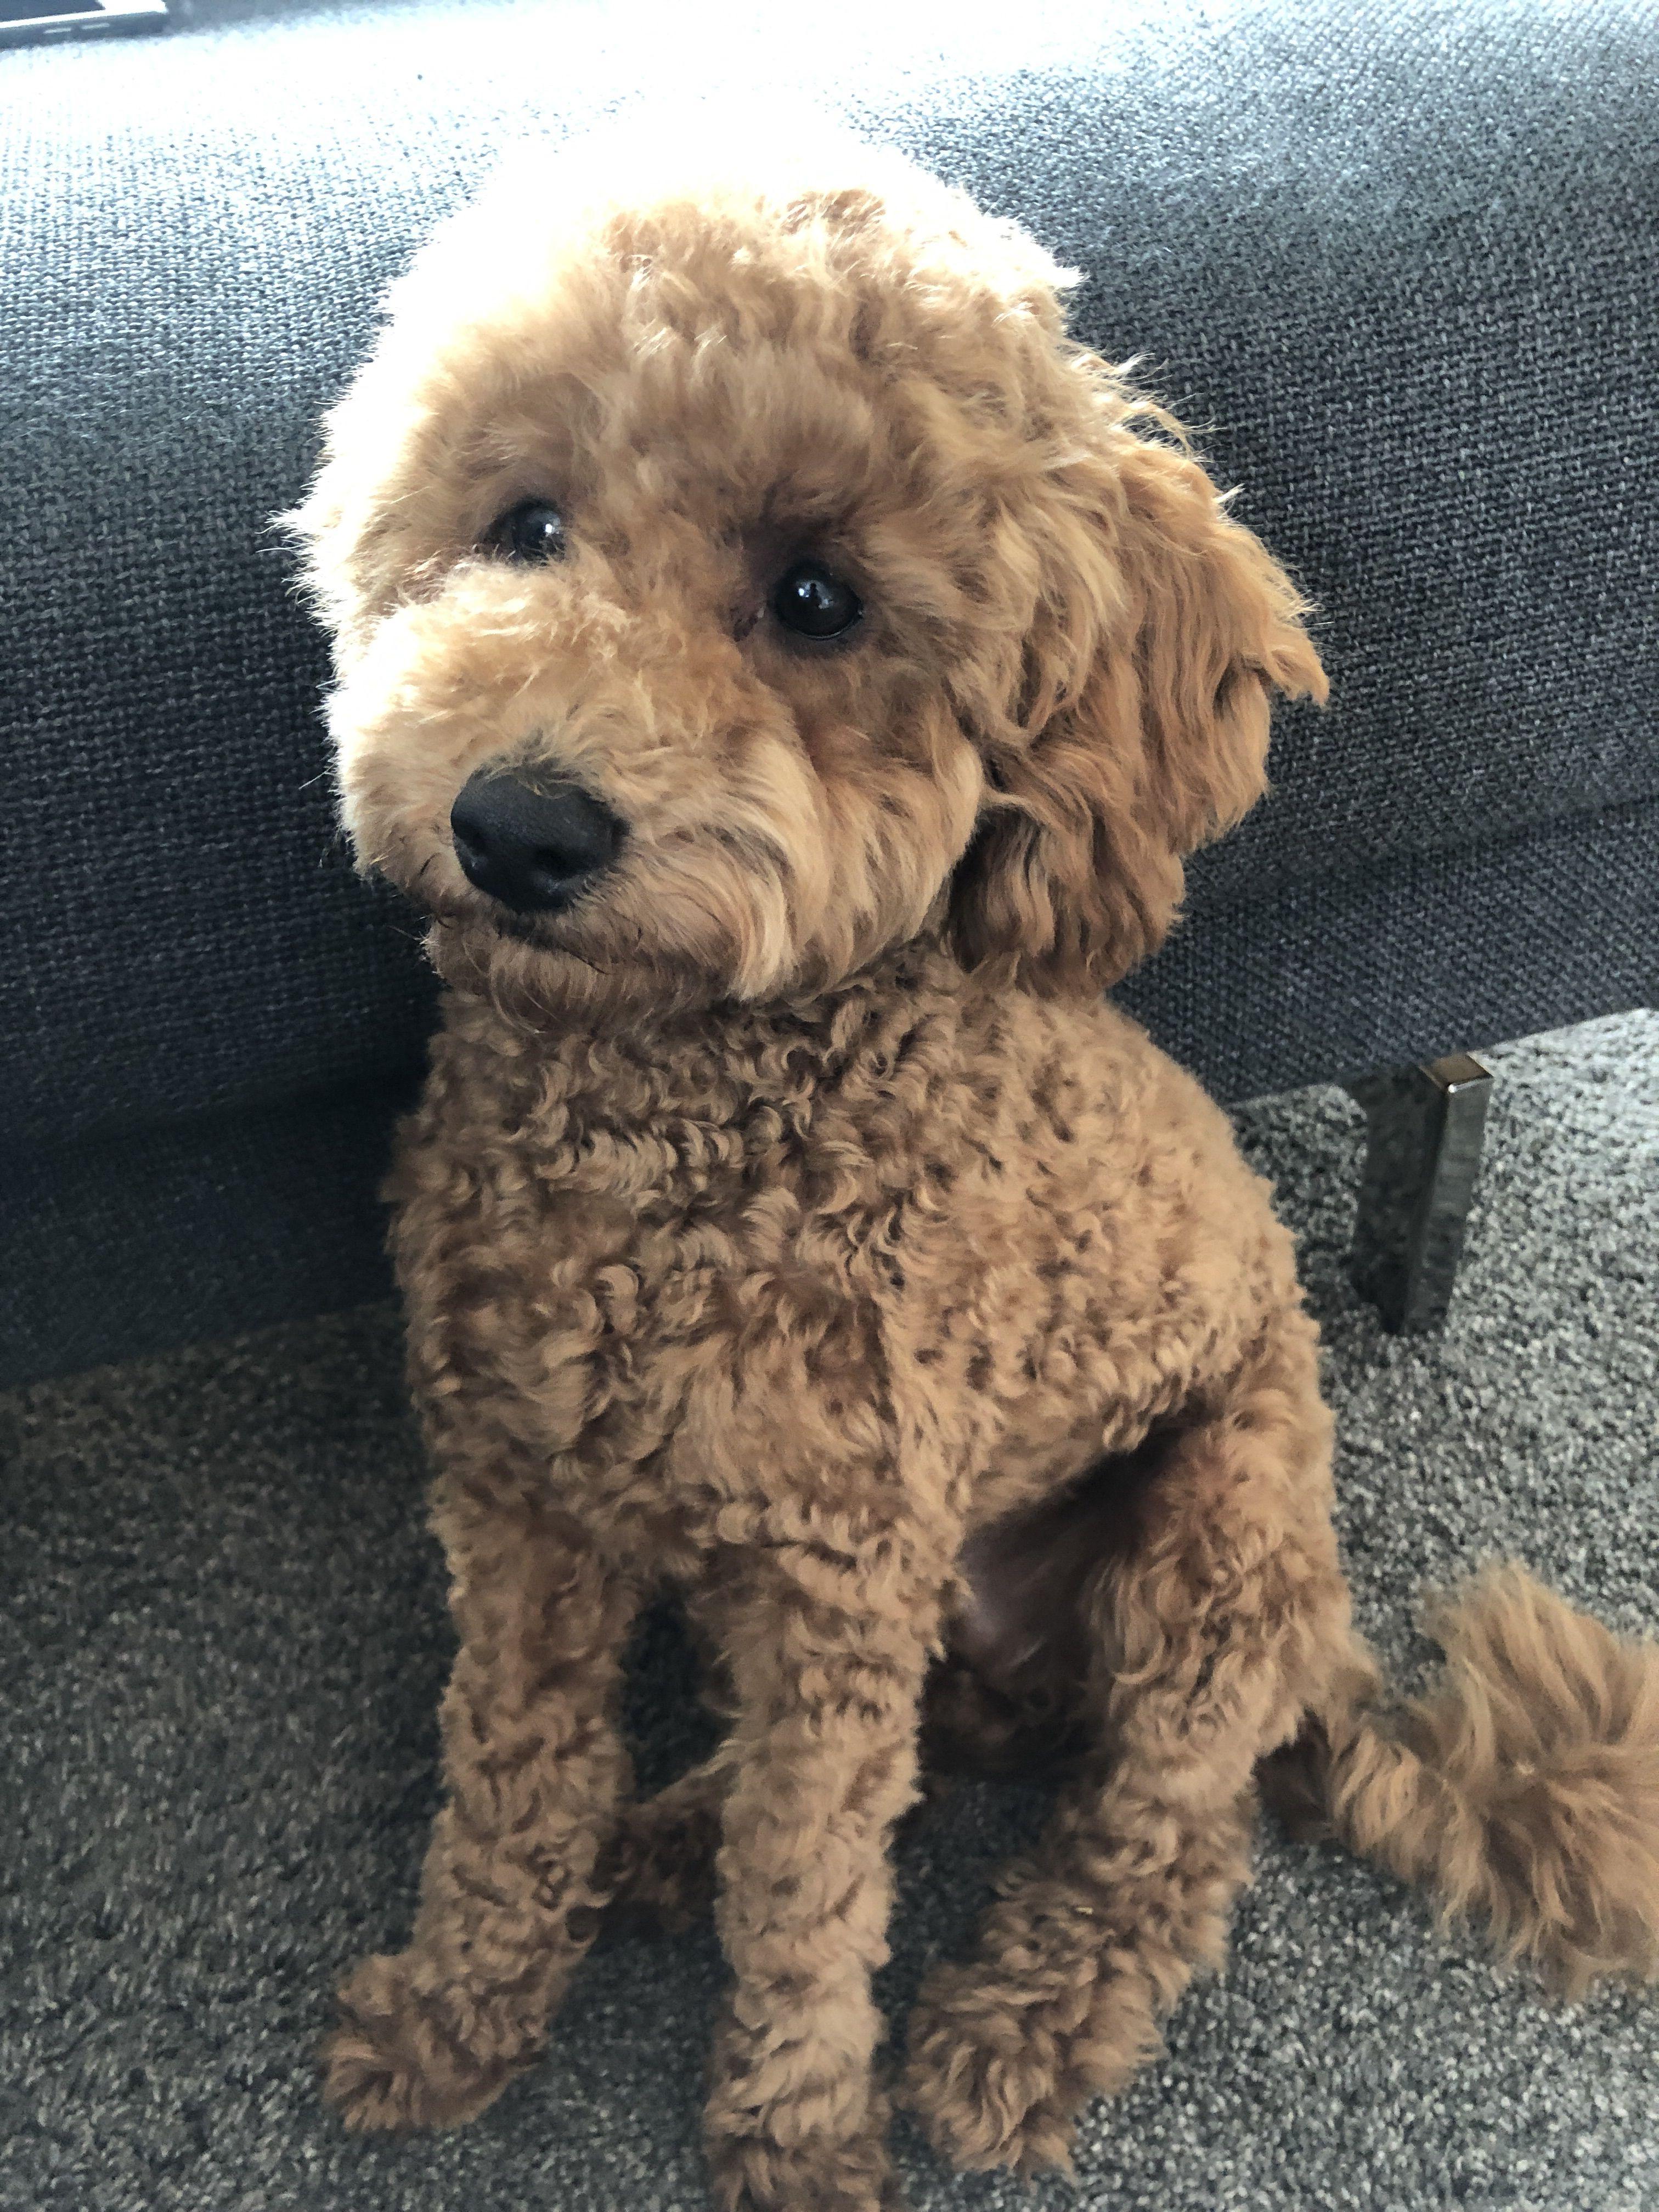 Moki Der Pudel Frisch Geschoren 22 Wochen Miniature Poodle Puppies Cockapoo